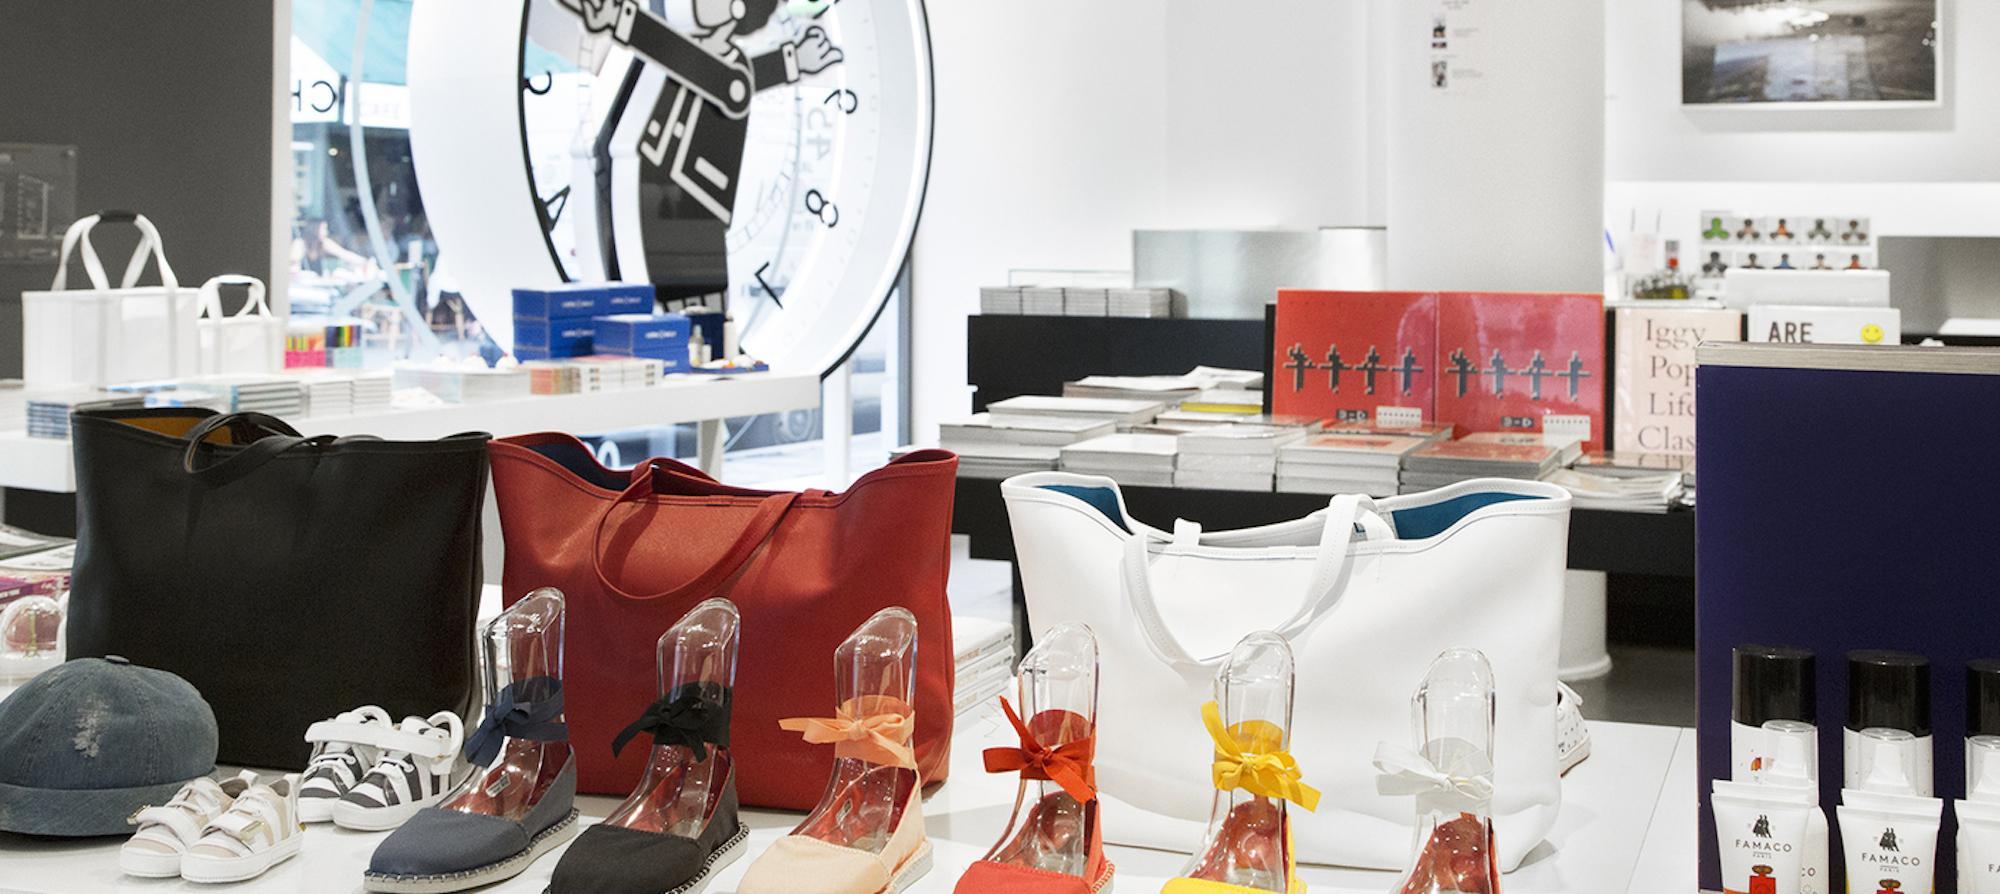 HiP Paris Blog says goodbye to Paris fashion institution Colette